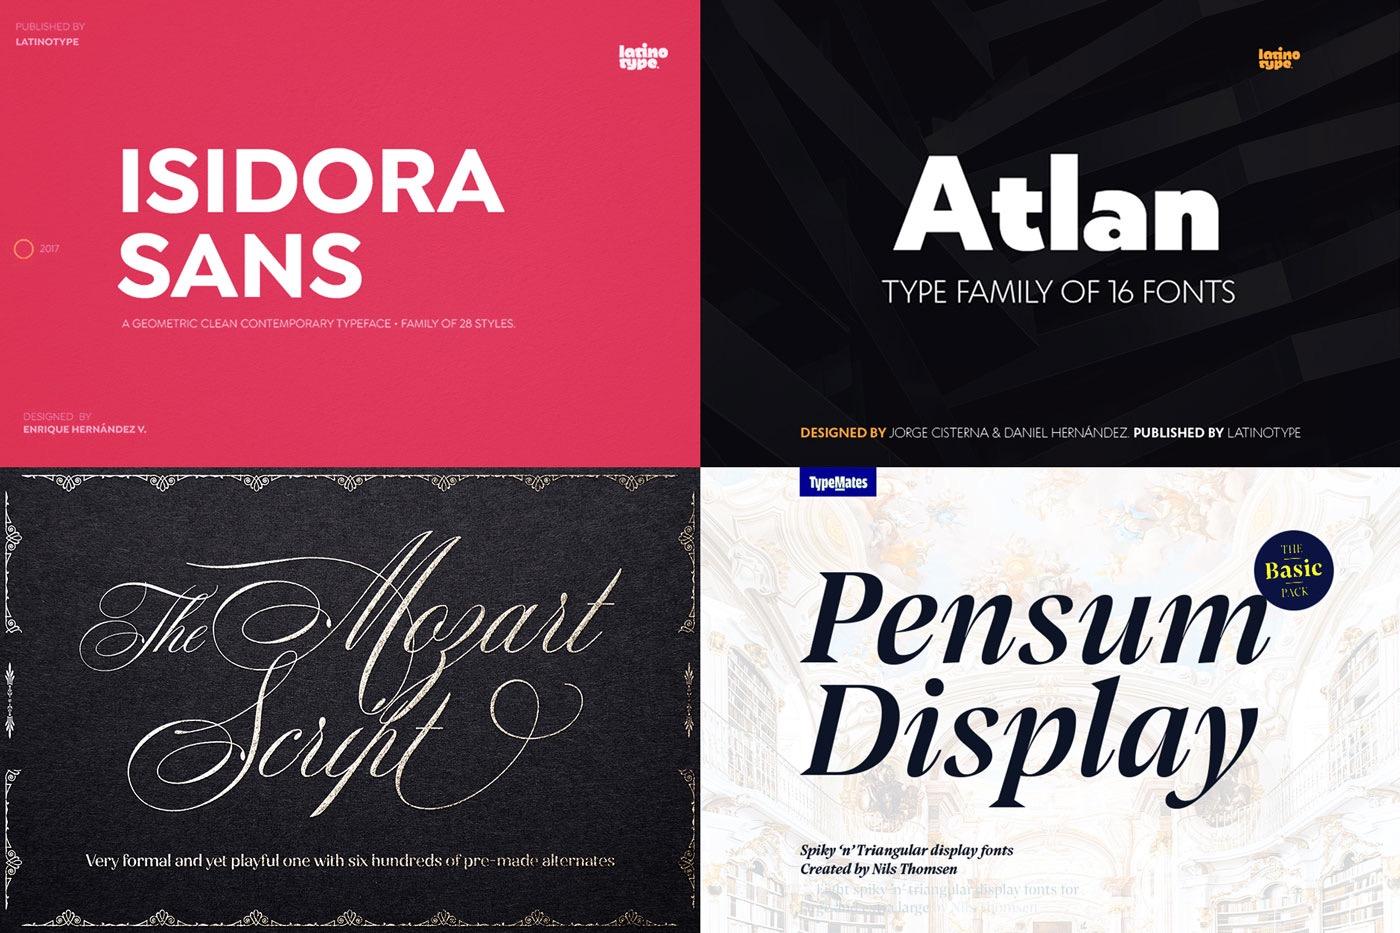 The-Creatives-Spectacular-Typography-Set-Top.jpg.6a563320ec82507aba1b5c544060d914.jpg